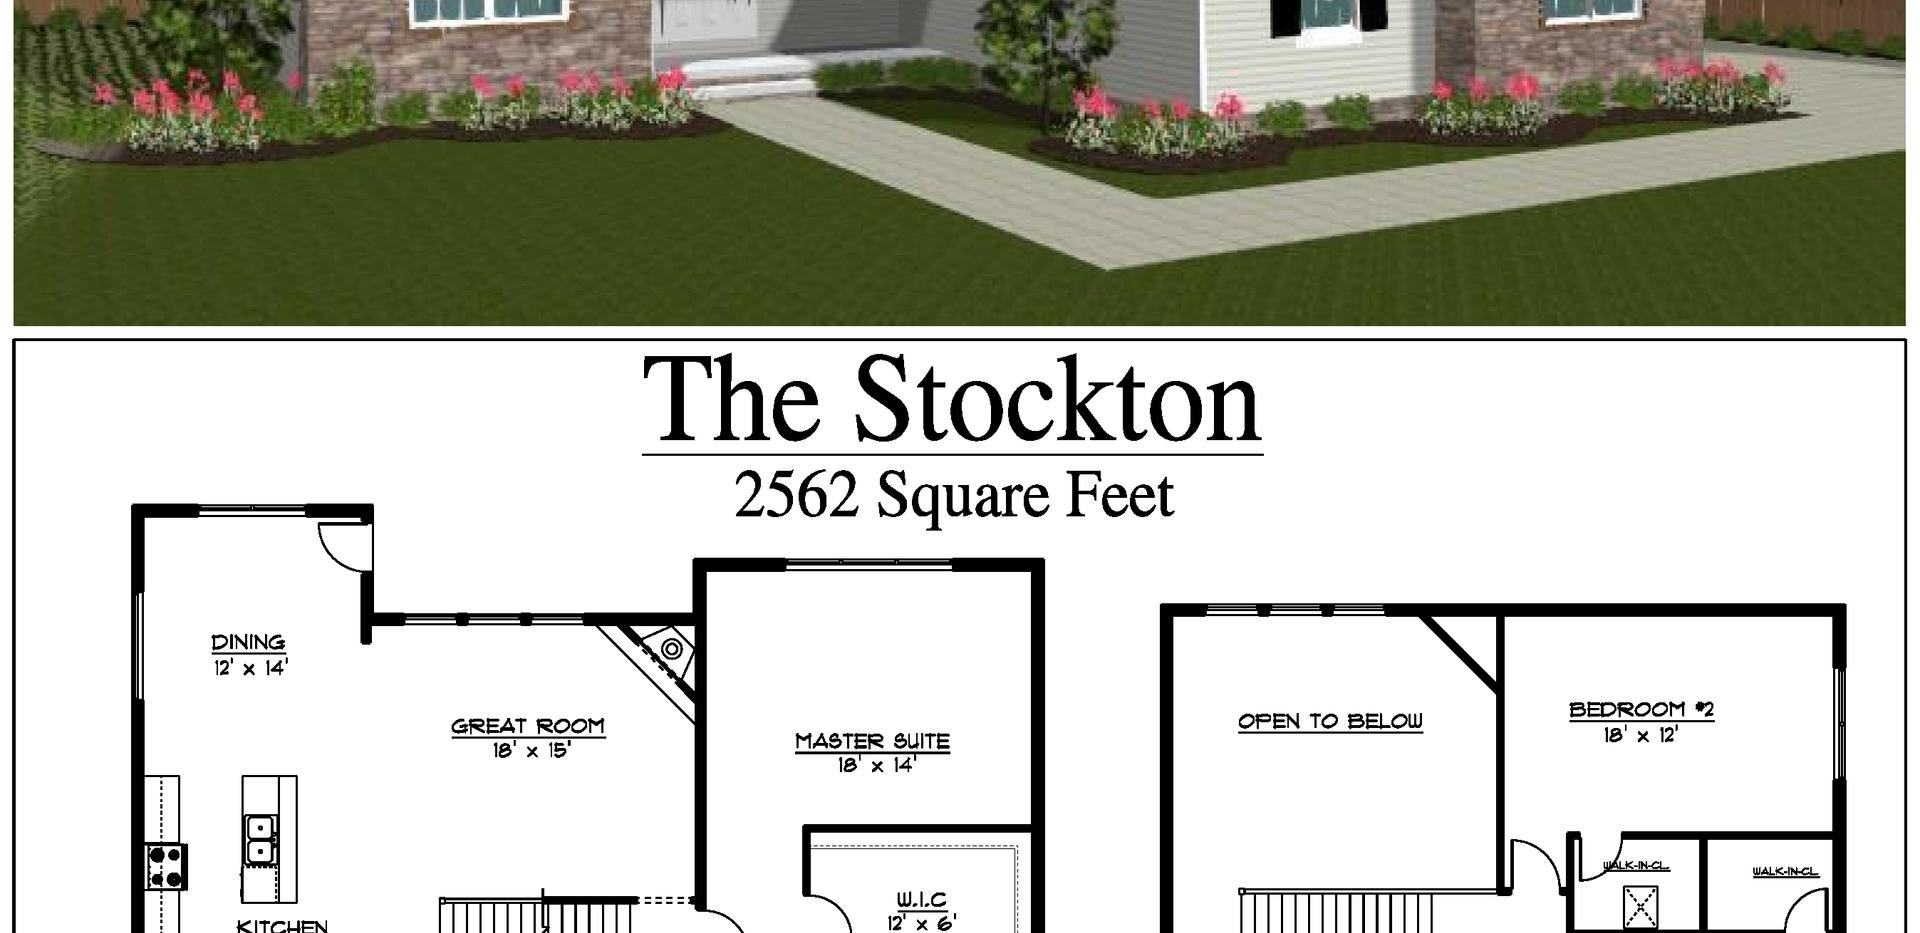 The Stockton